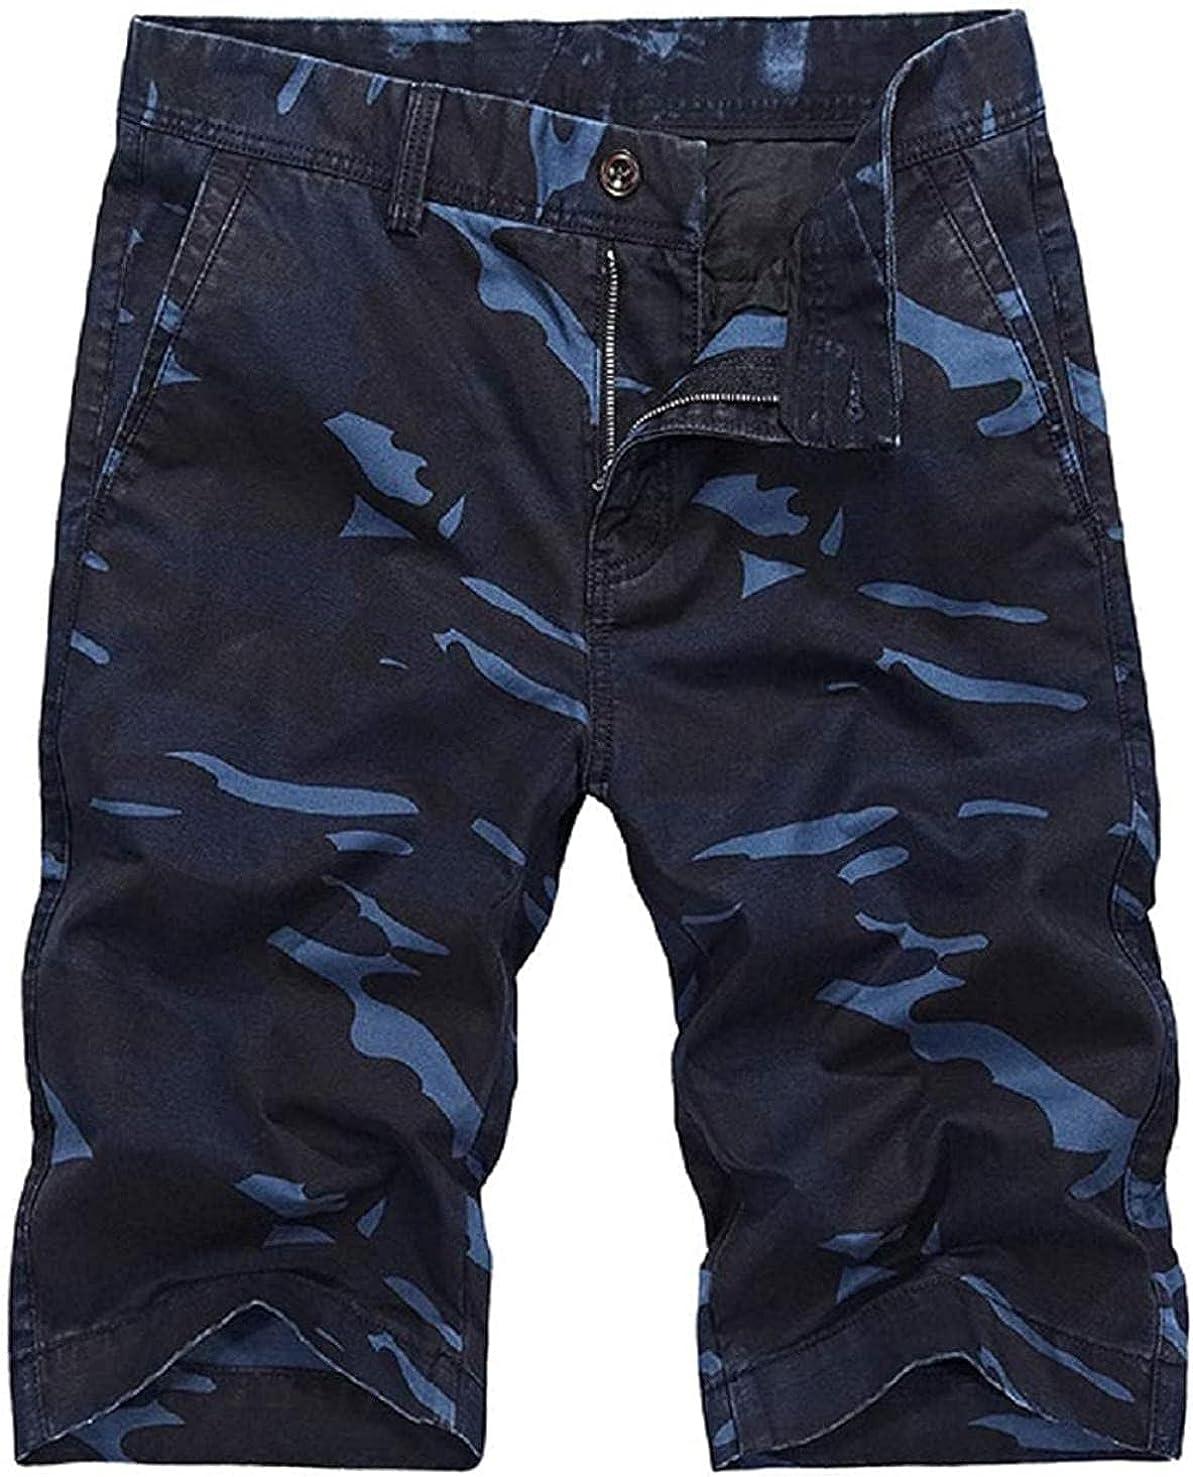 Rsqsjgkert Men's Natural Waist Camouflage Straight Leg Multi-Pocket Bermuda Cargo Shorts